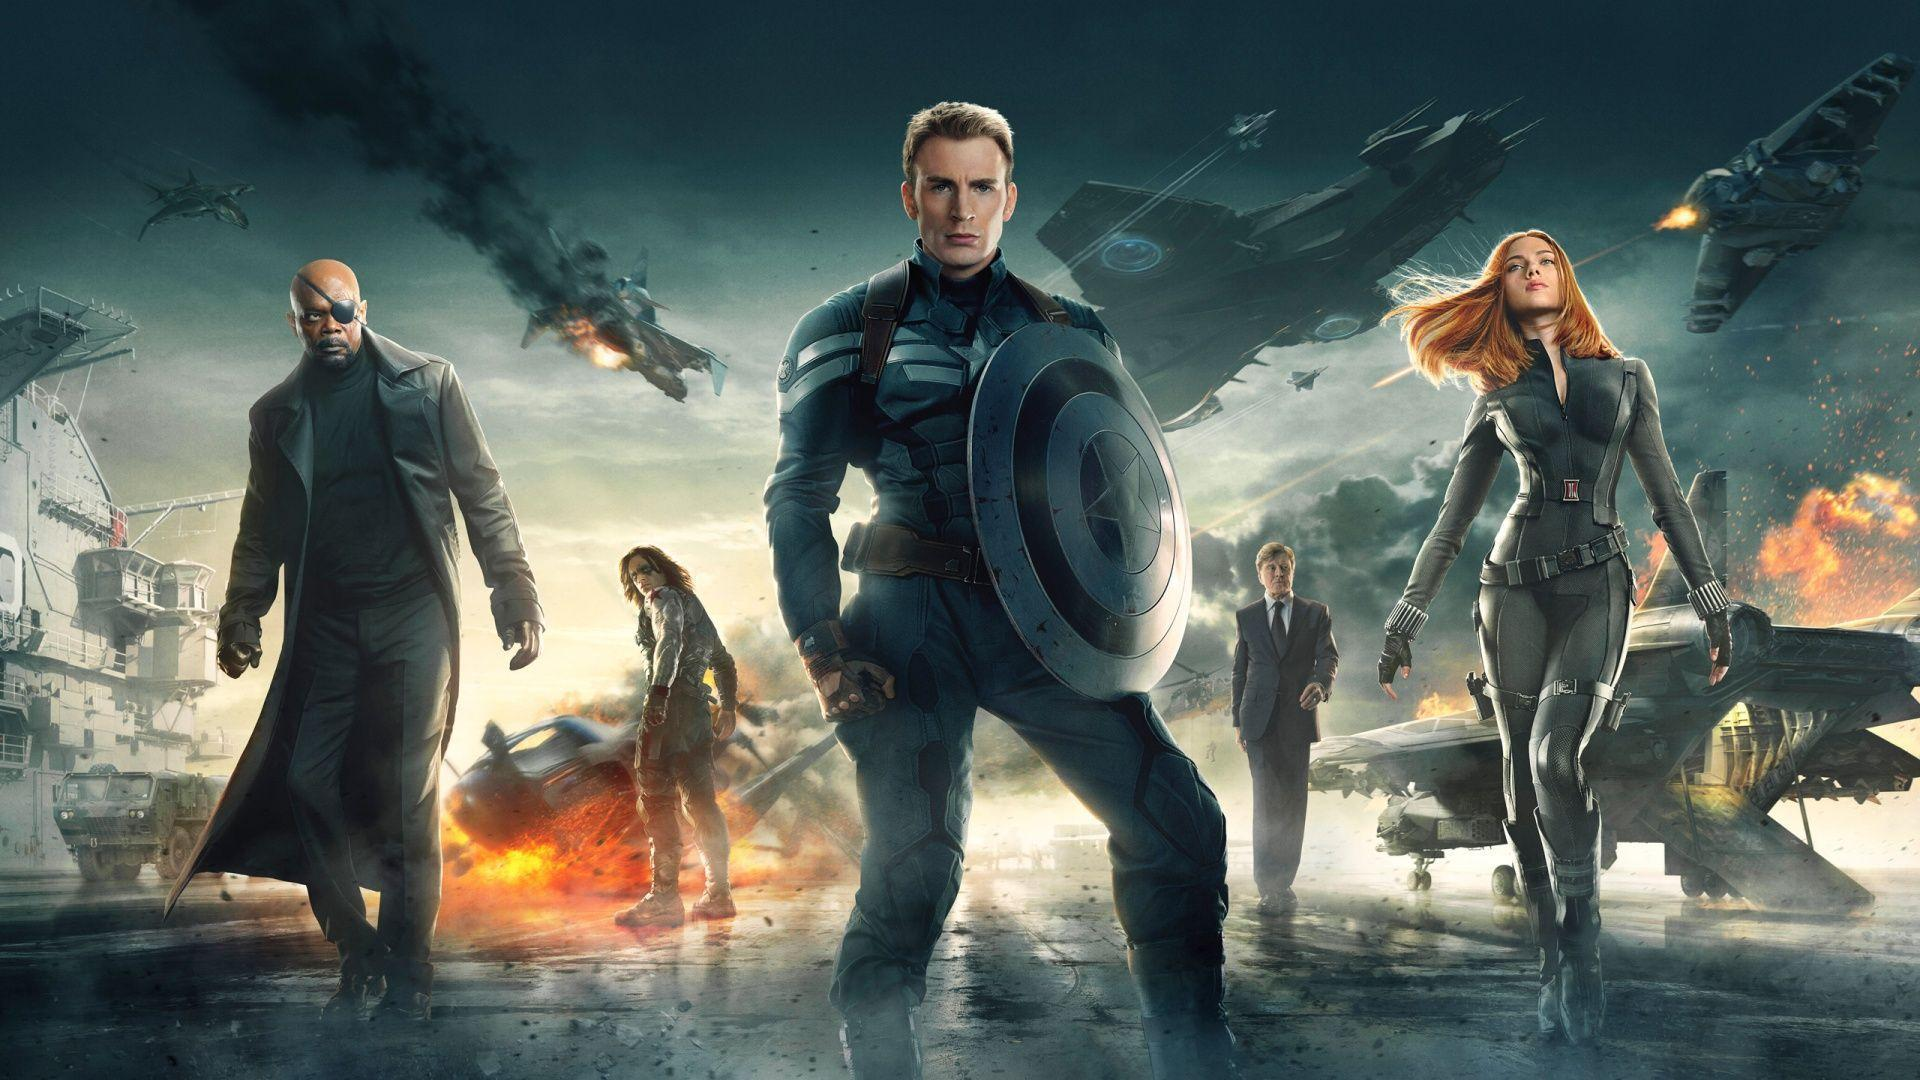 Captain America Chris Evans Wallpaper - wallpaper.